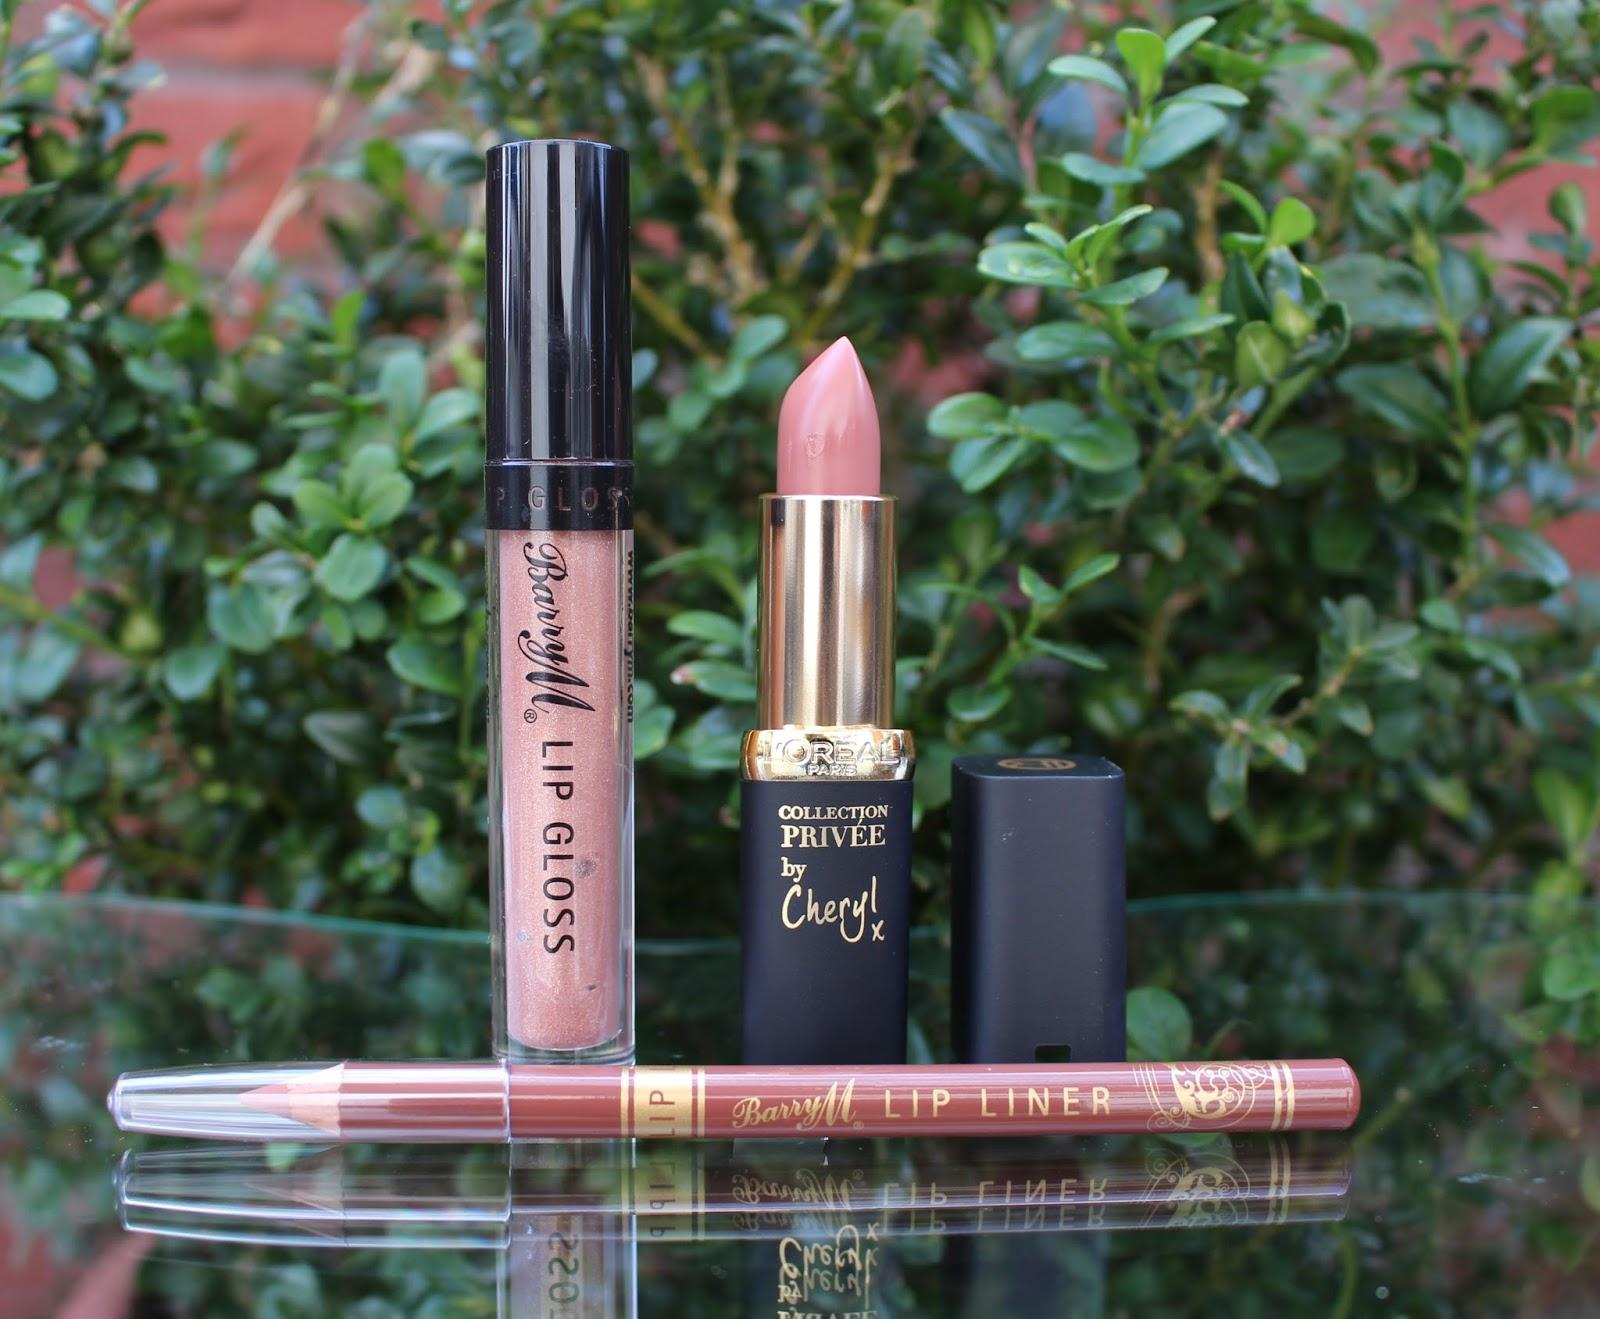 the nude lip, nude lipstick, nude lip, drudstore nude lip, through chelsea's eyes, barry m , Loreal, loreal cheryl's nude